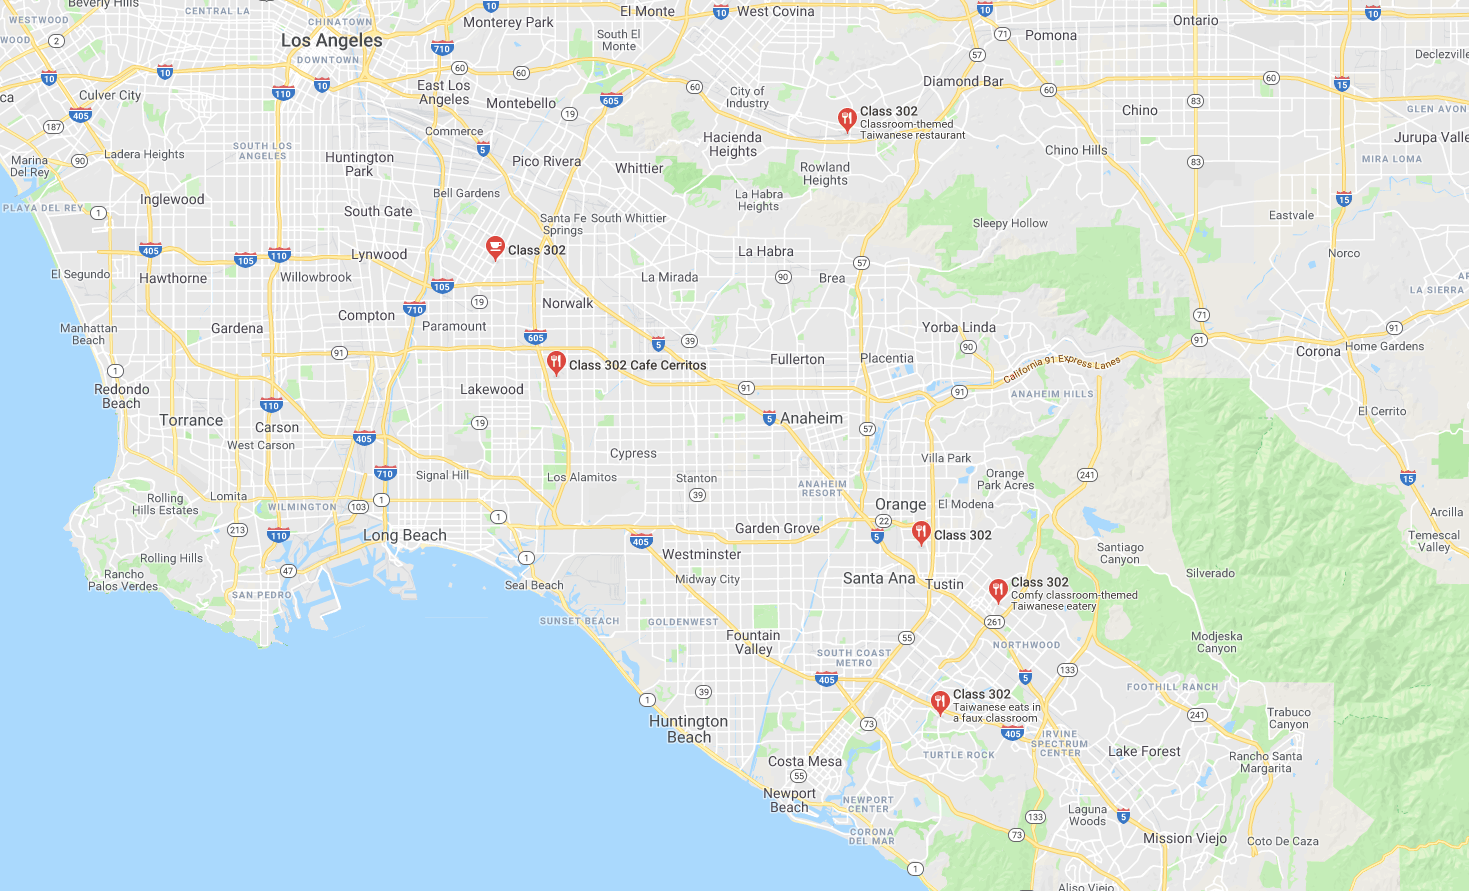 class 302 locations